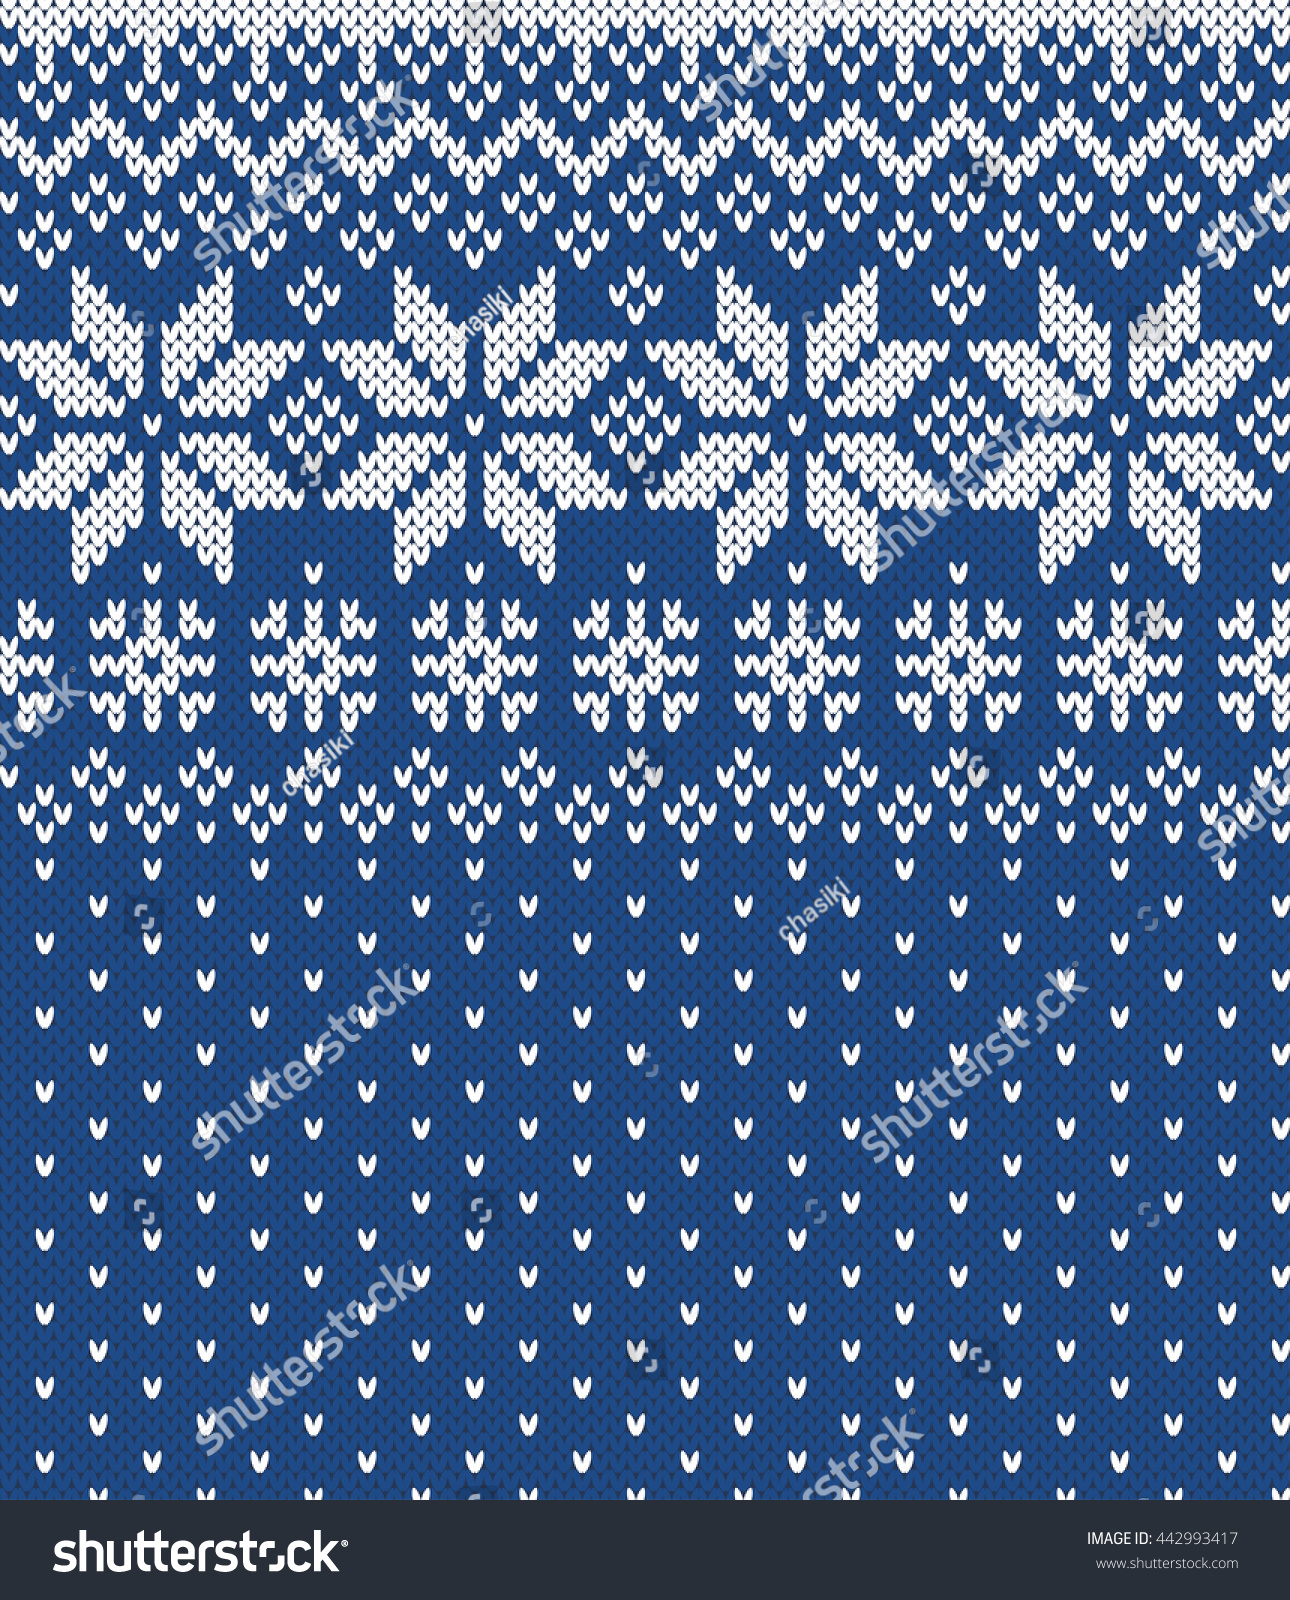 Winter Sweater Design Seamless Knitting Pattern Stock Vector ...